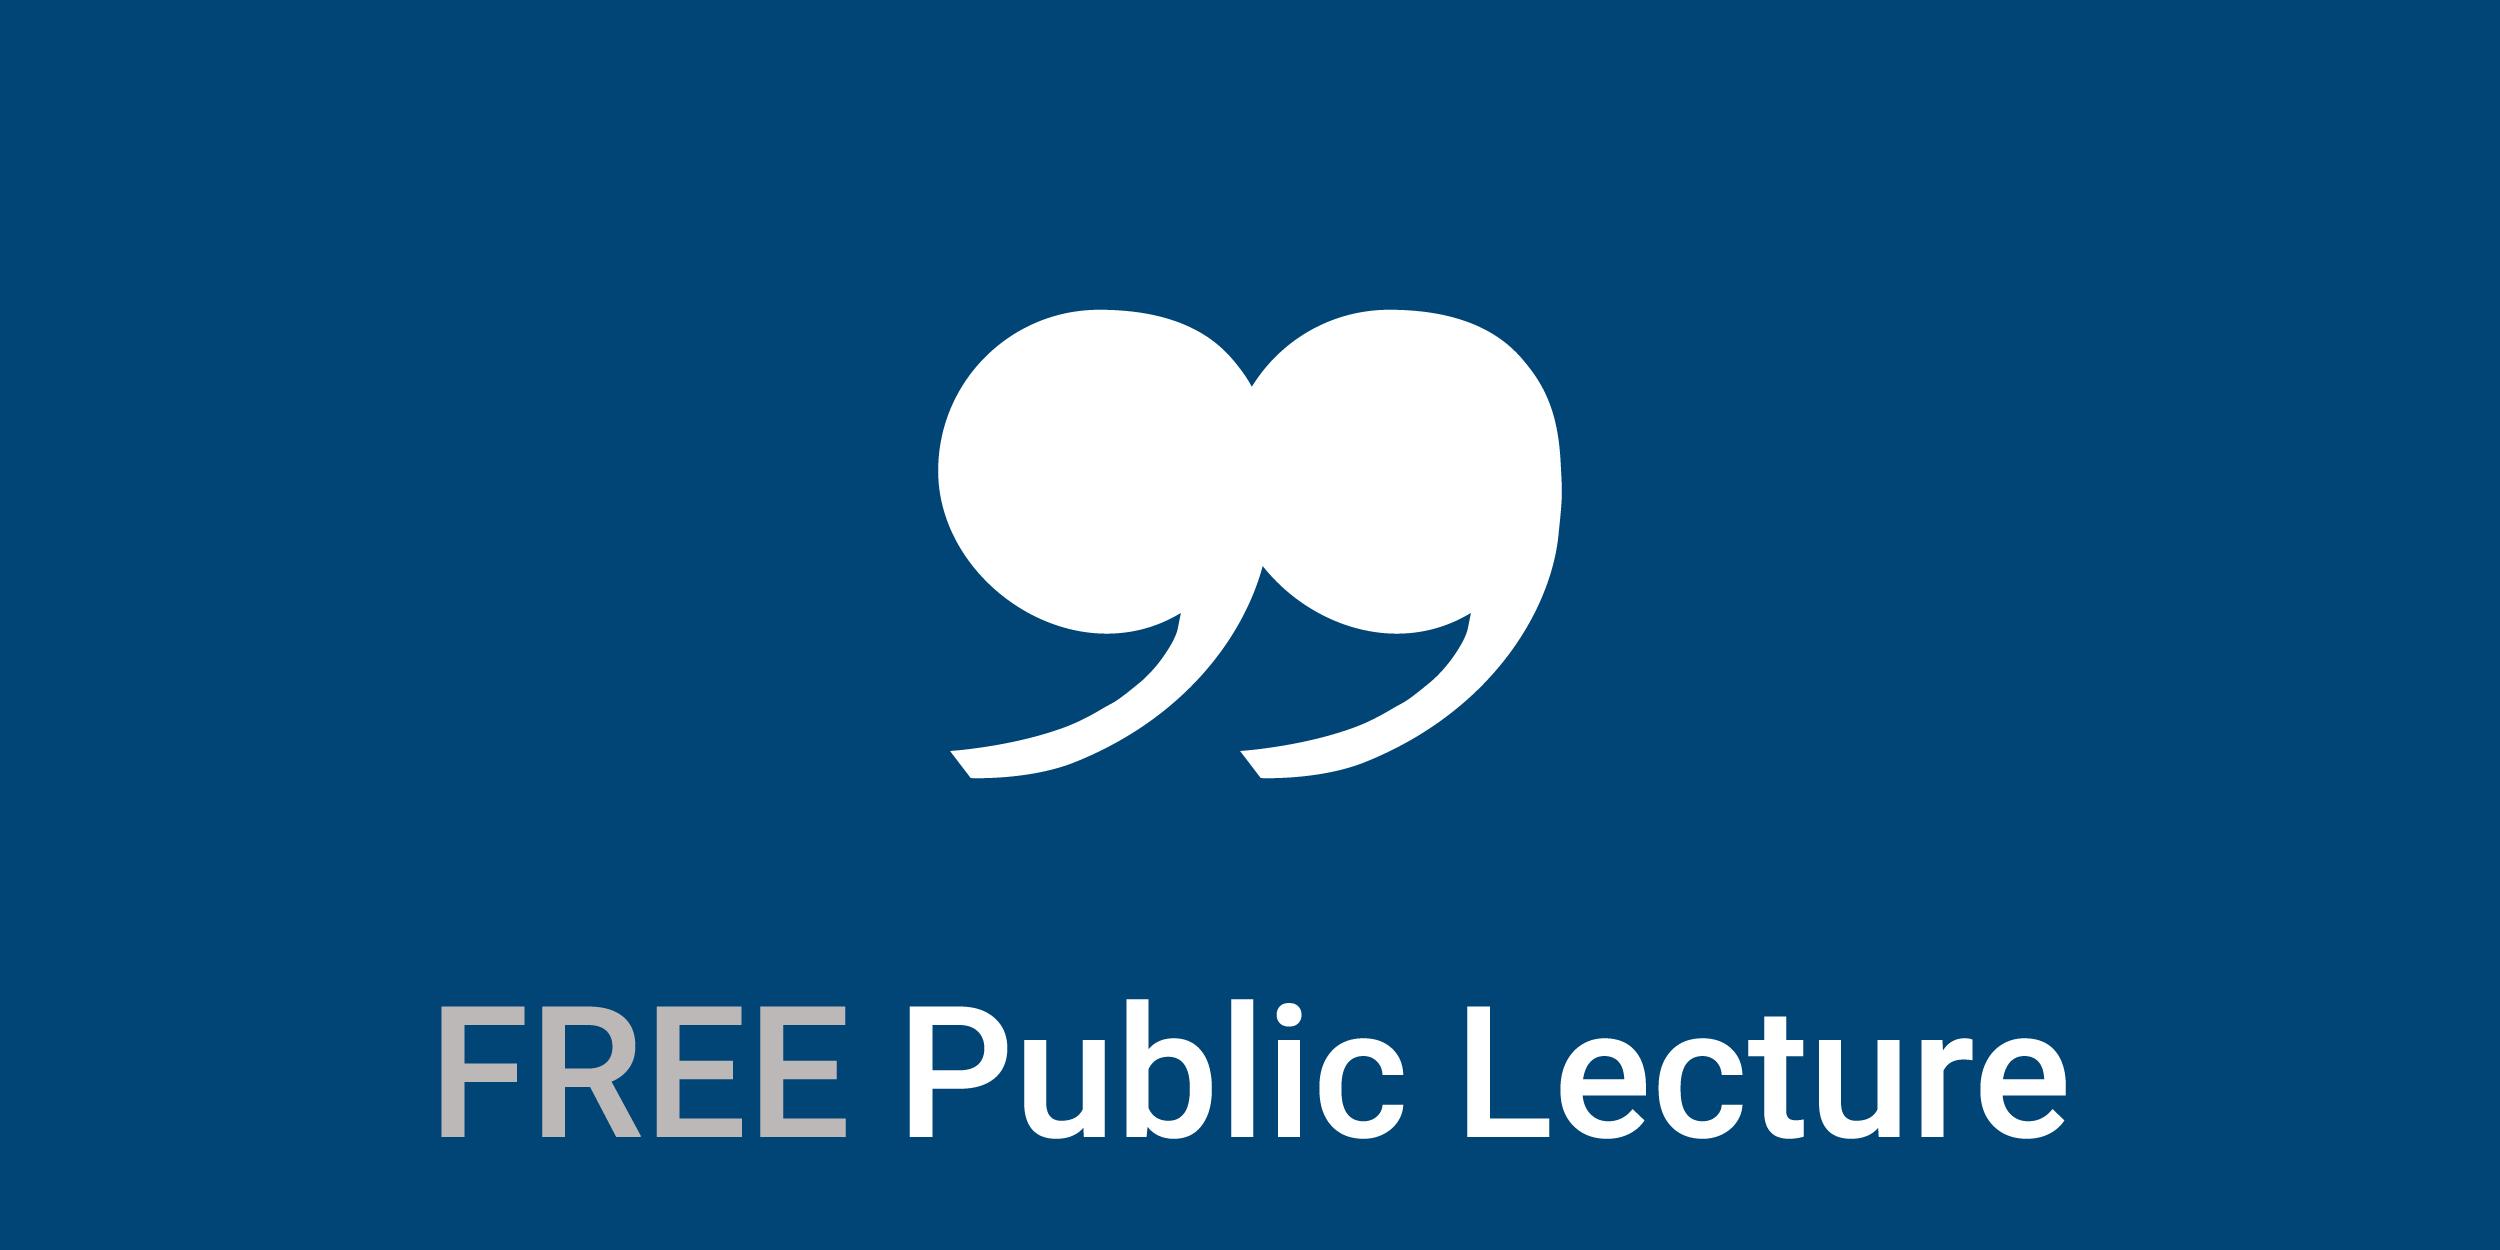 Free Public Lecture Banner